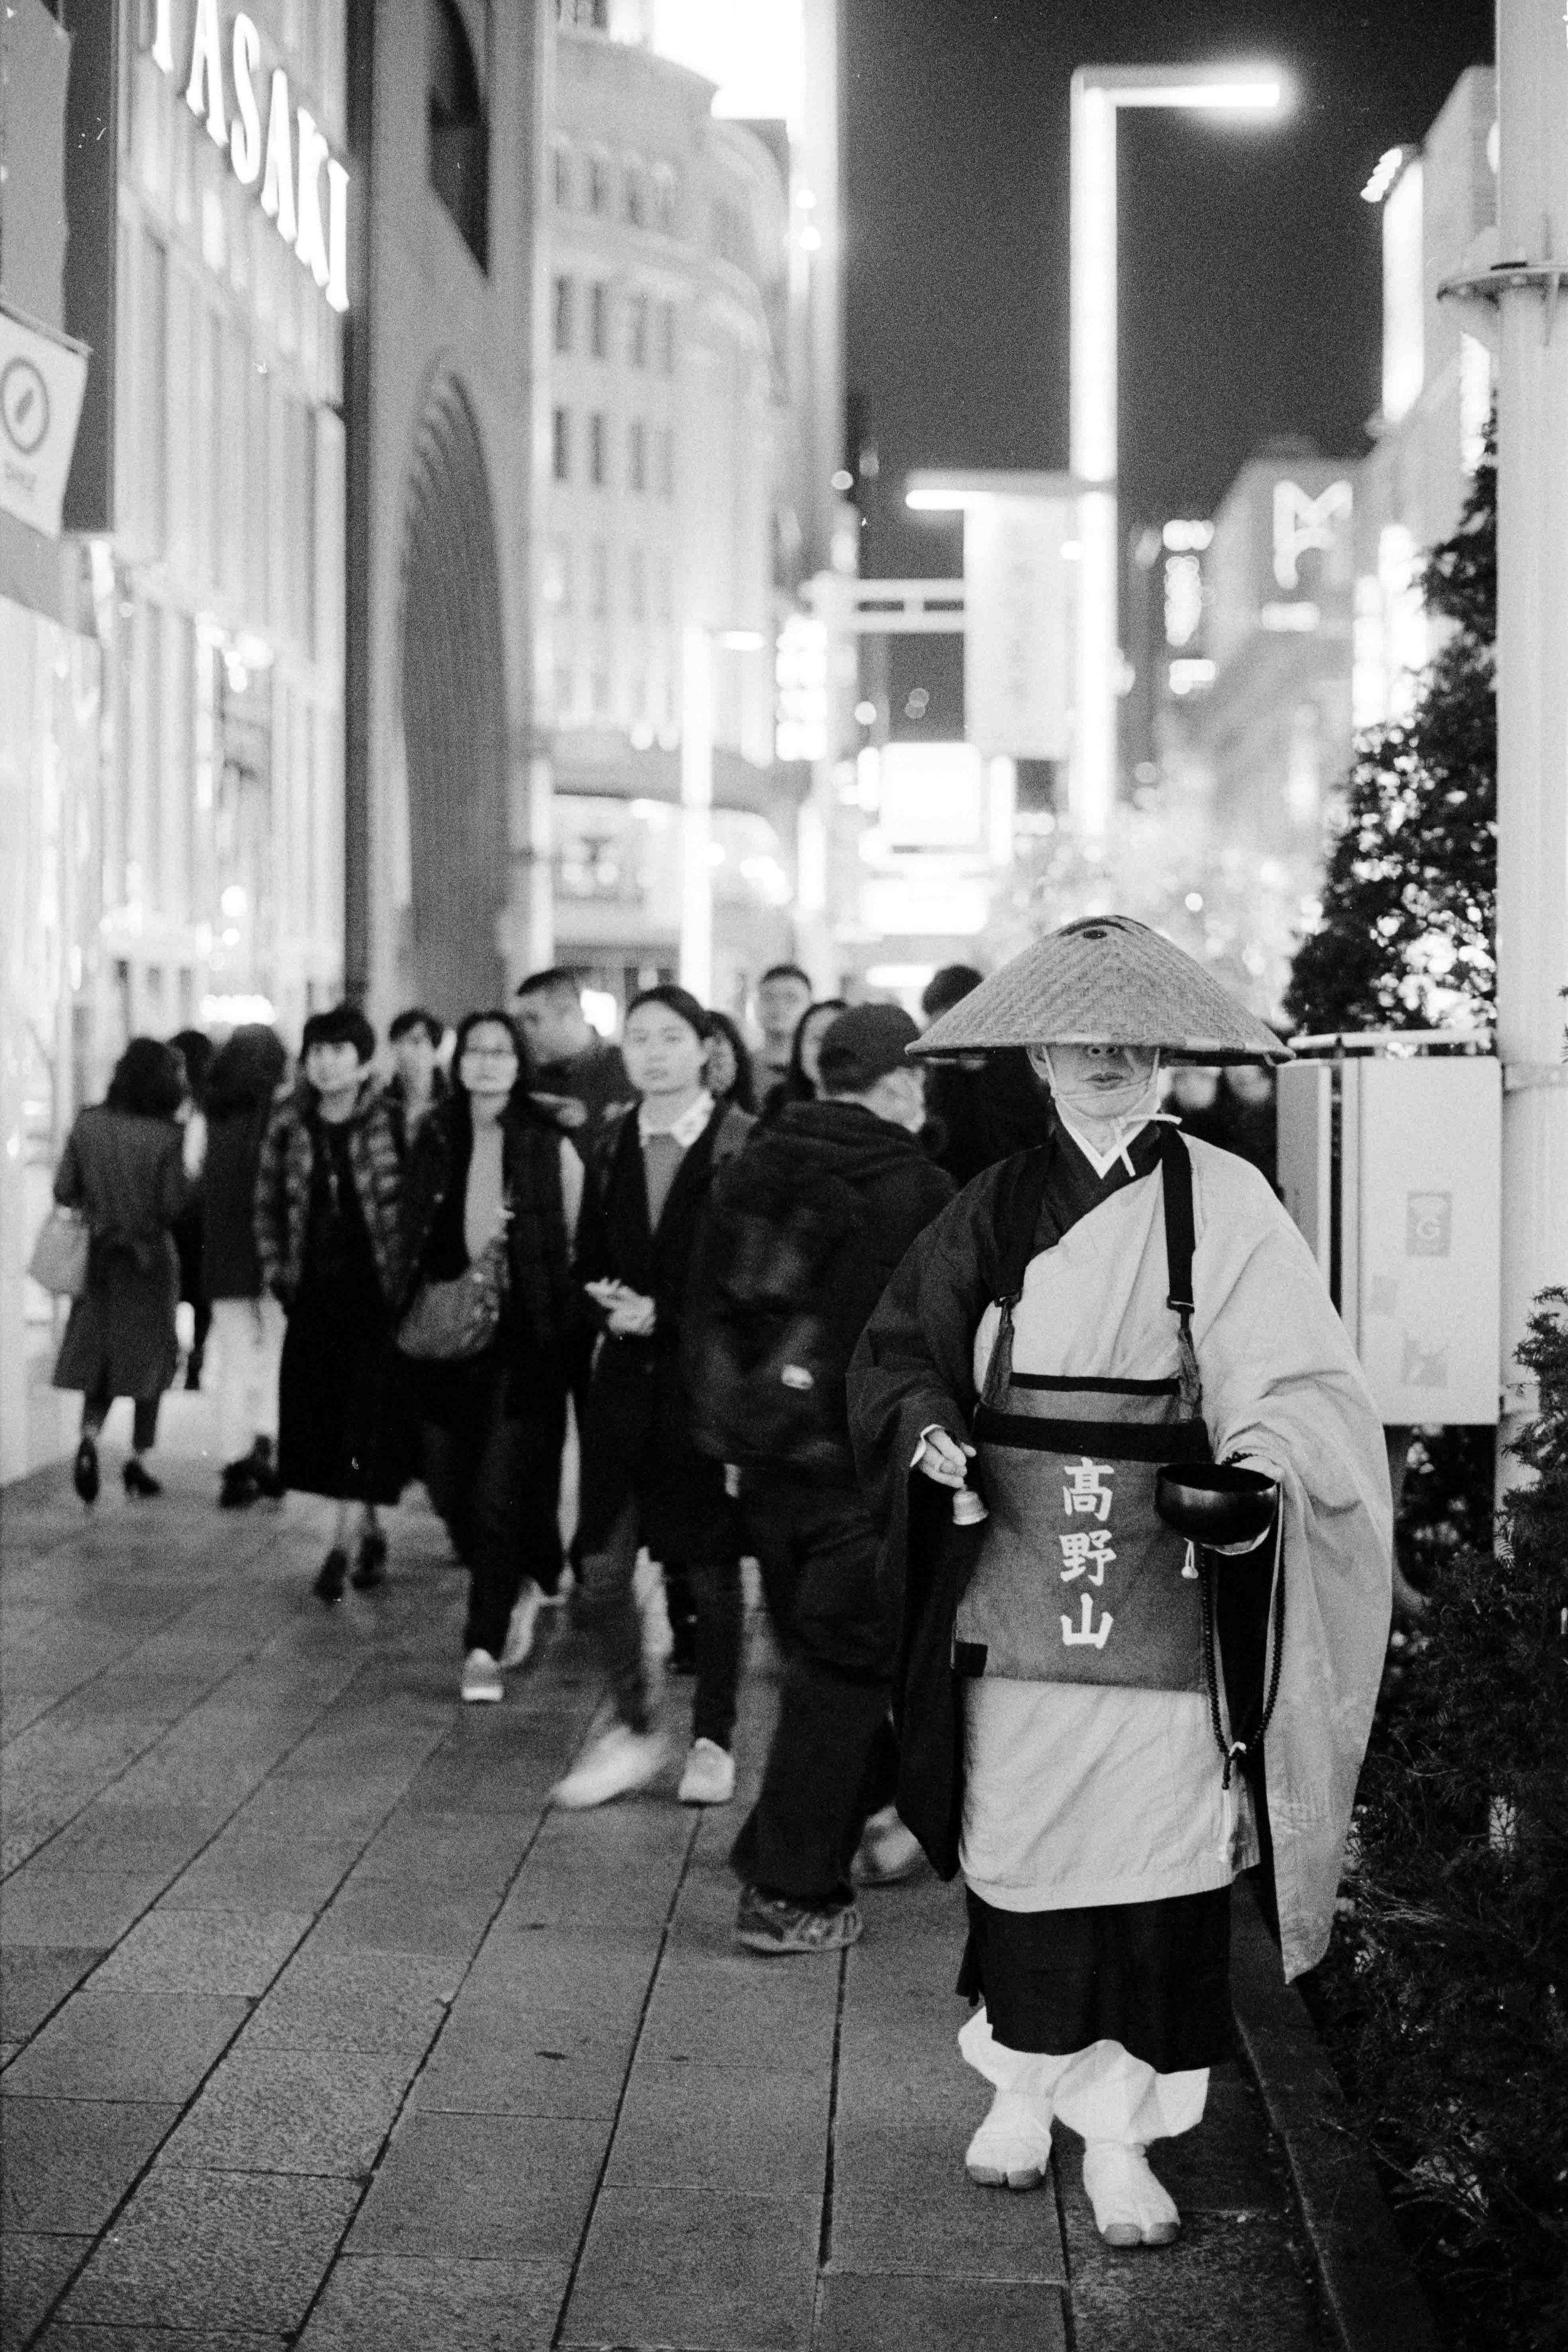 Tokyo - Japan 2016